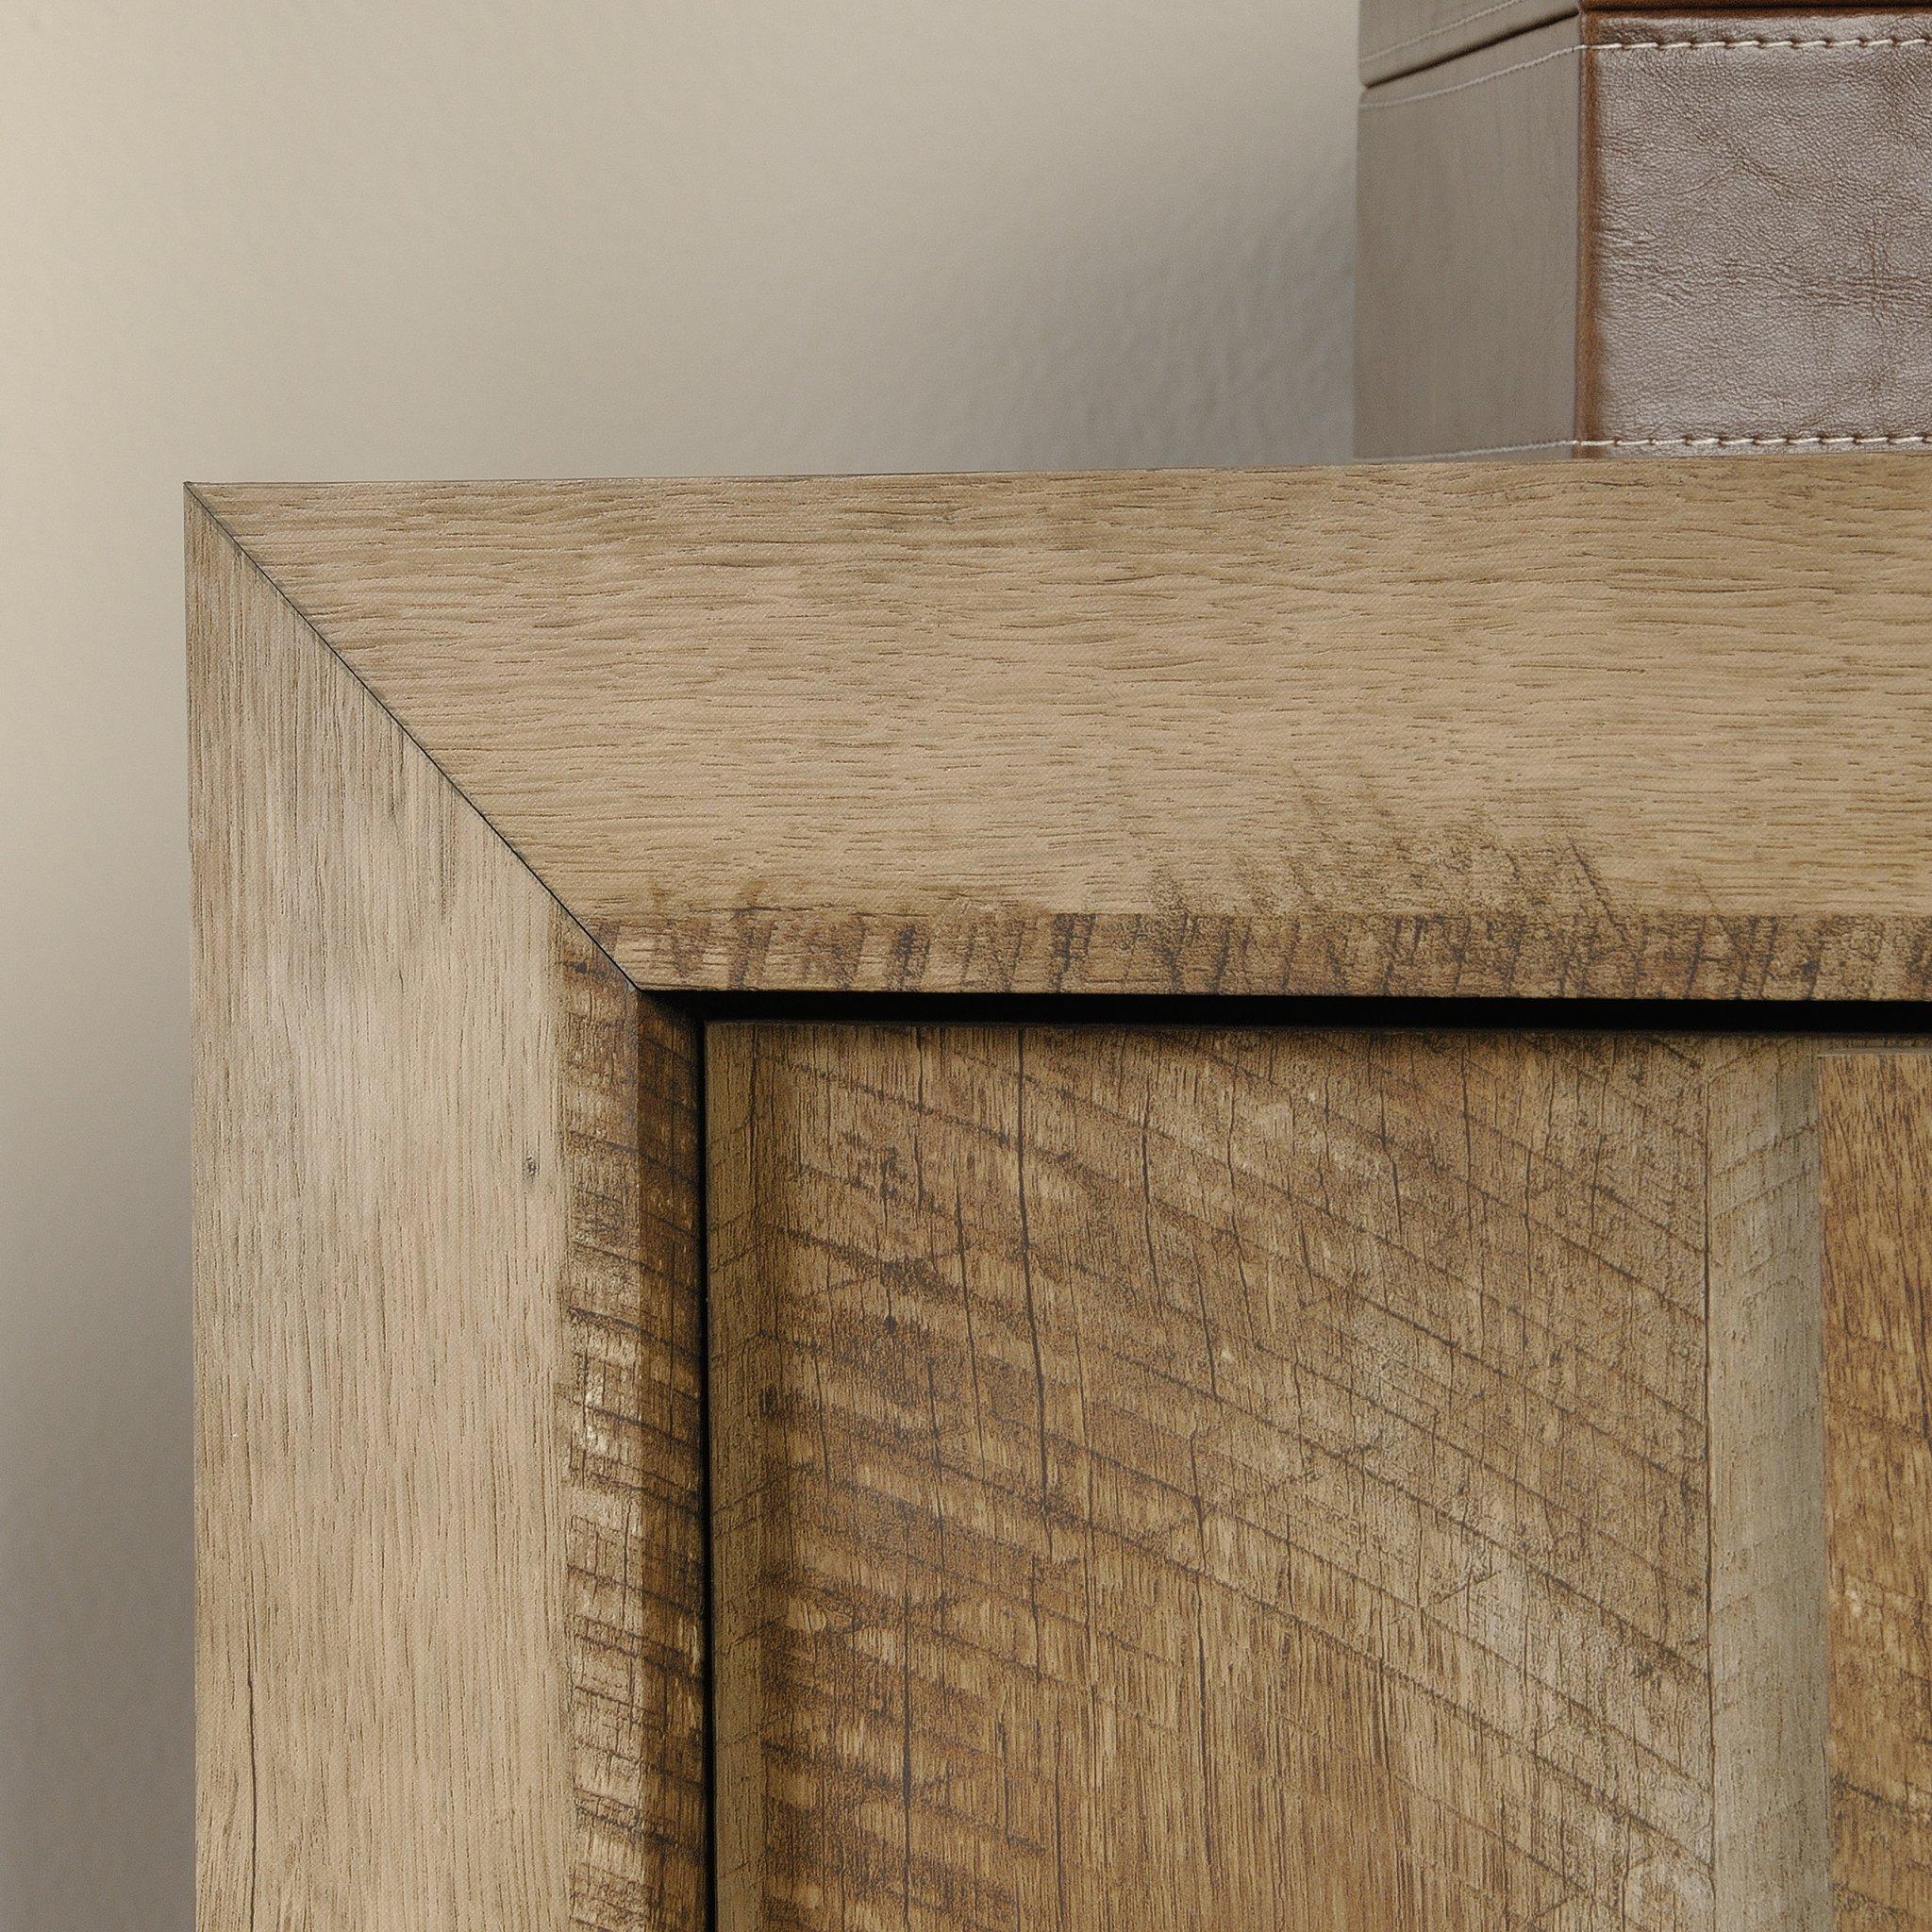 Sauder 419077 Dakota Pass Armoire, 33.78'' L x 19.53'' W x 57.84'' H, Craftsman Oak finish by Sauder (Image #10)